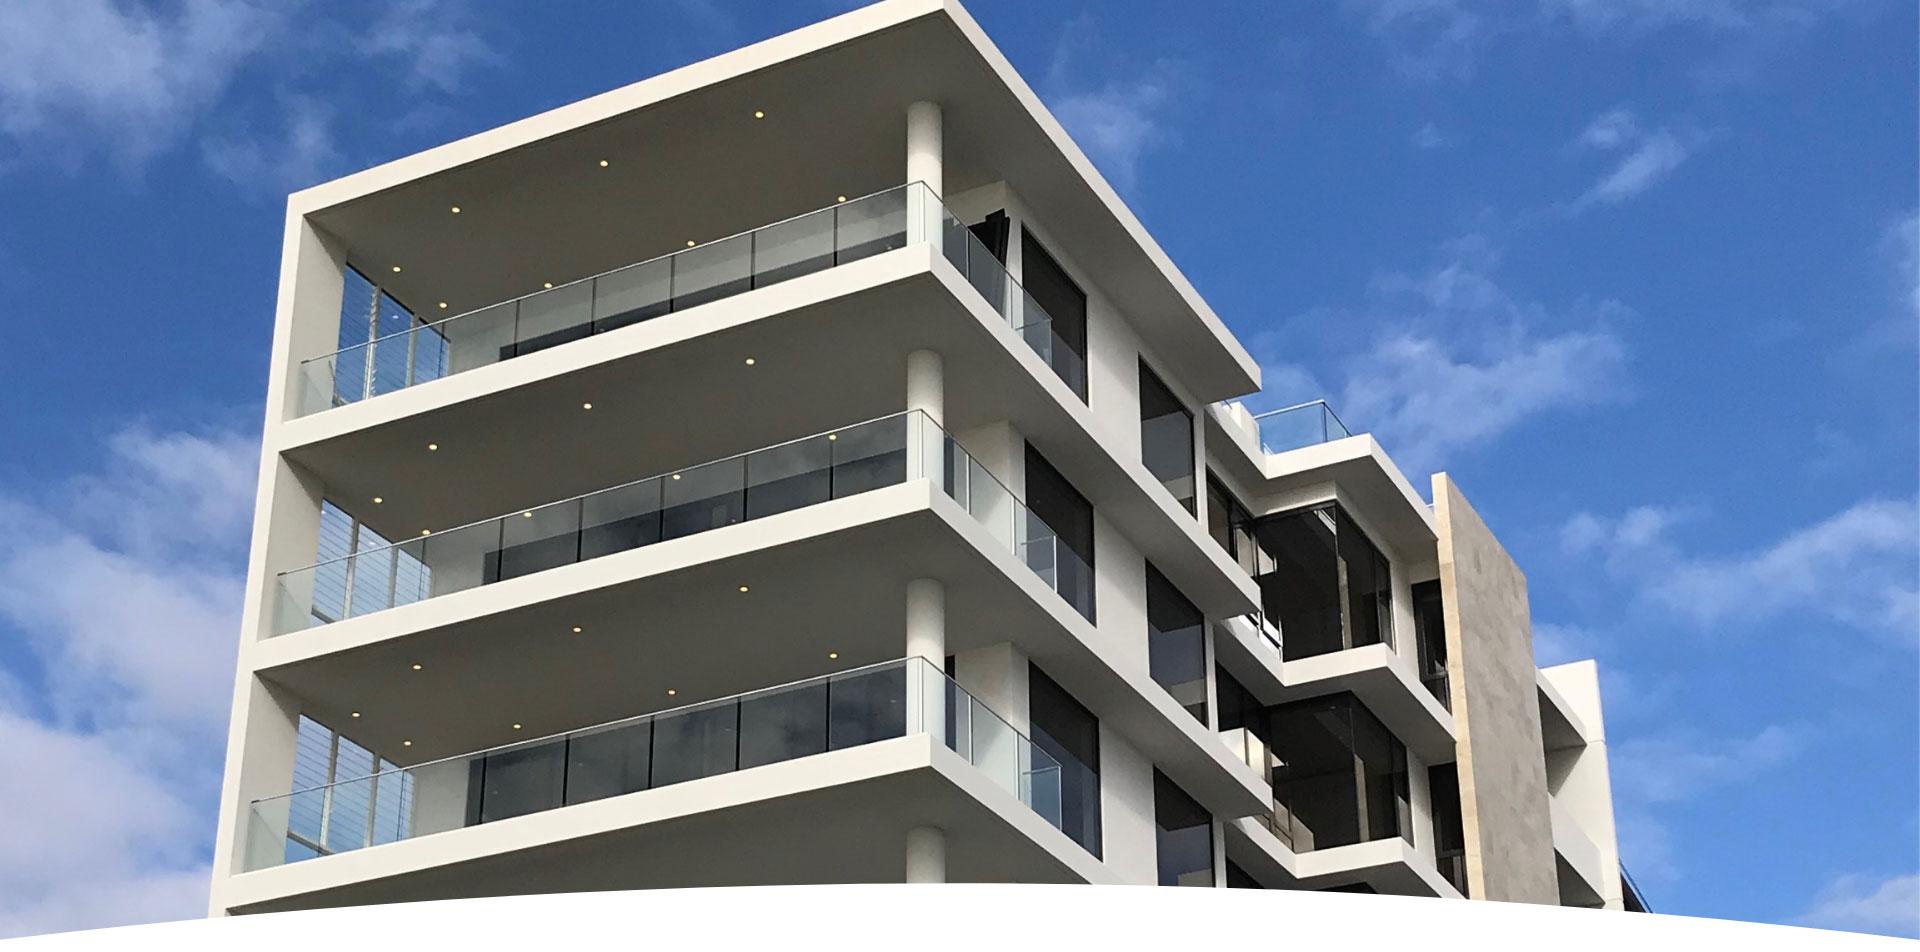 Beachfront Residential Paradise featuring Frameless Glass Balustrades